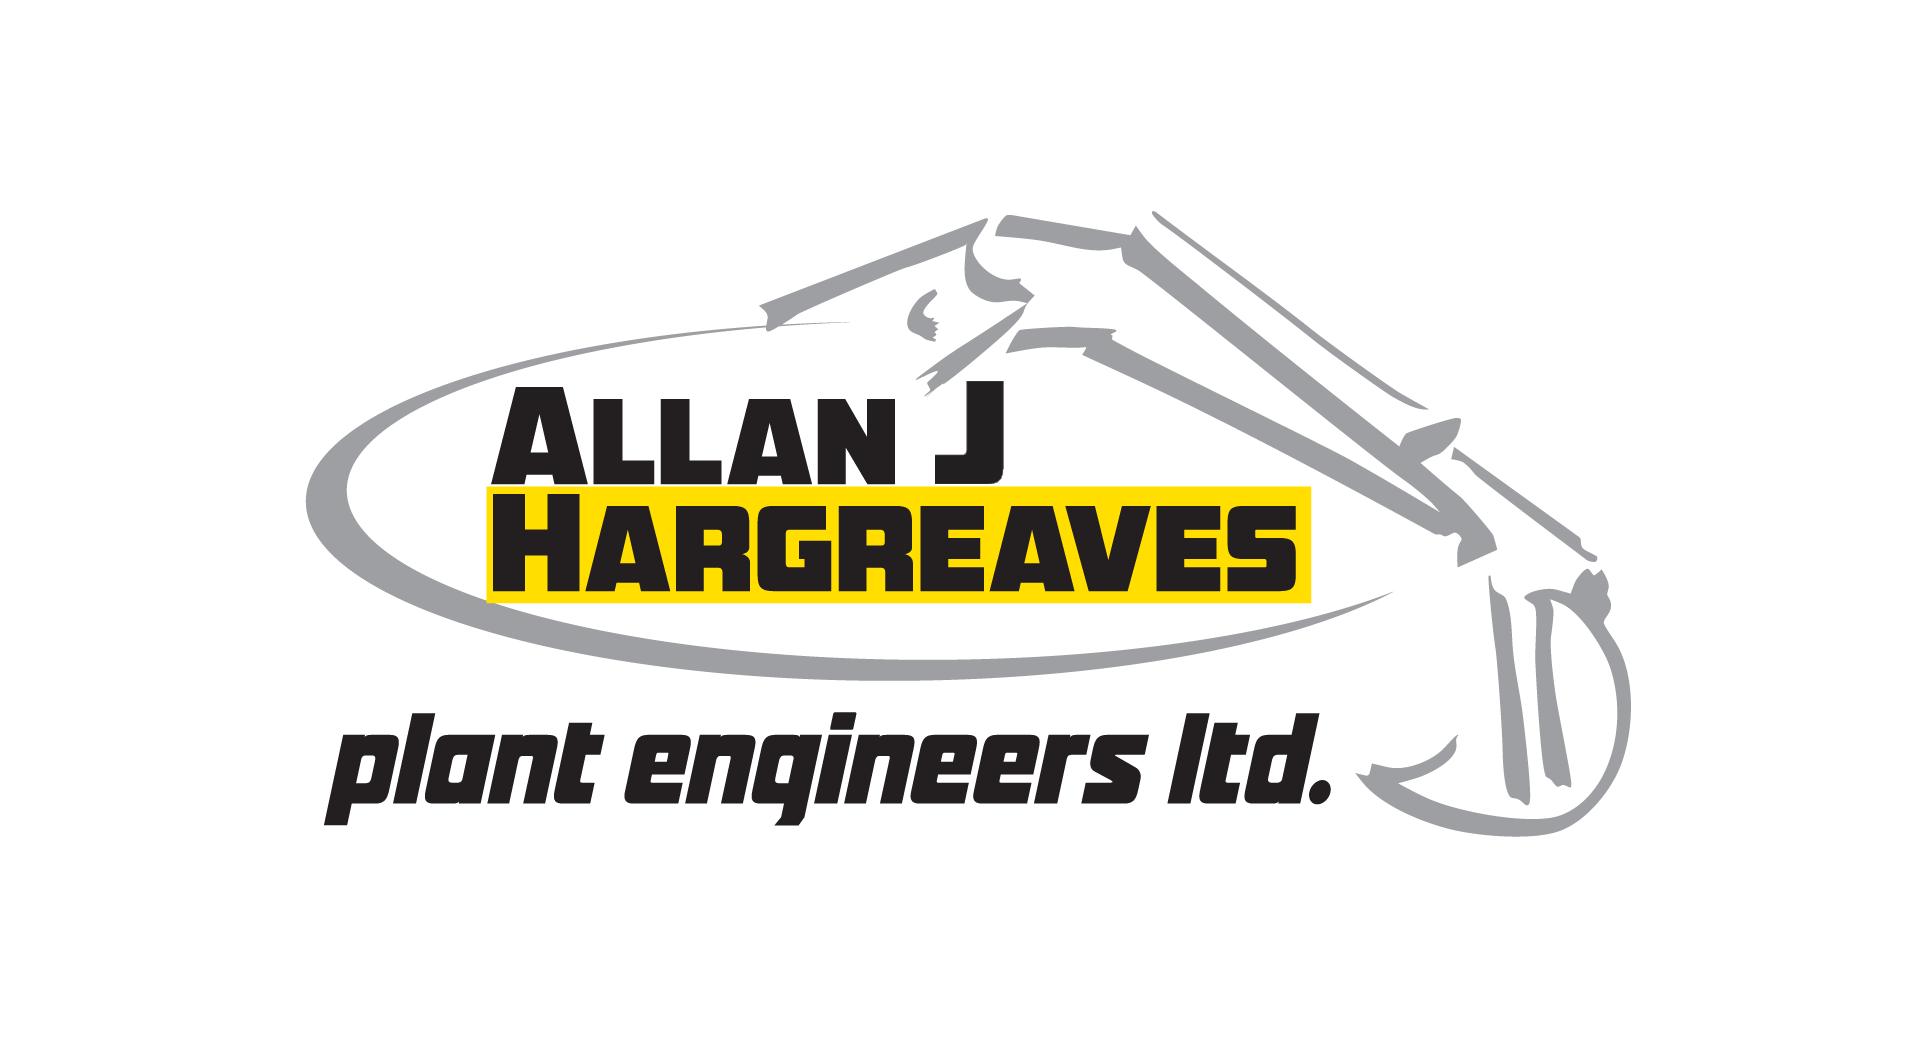 Allan J Hargreaves Plant Engineers